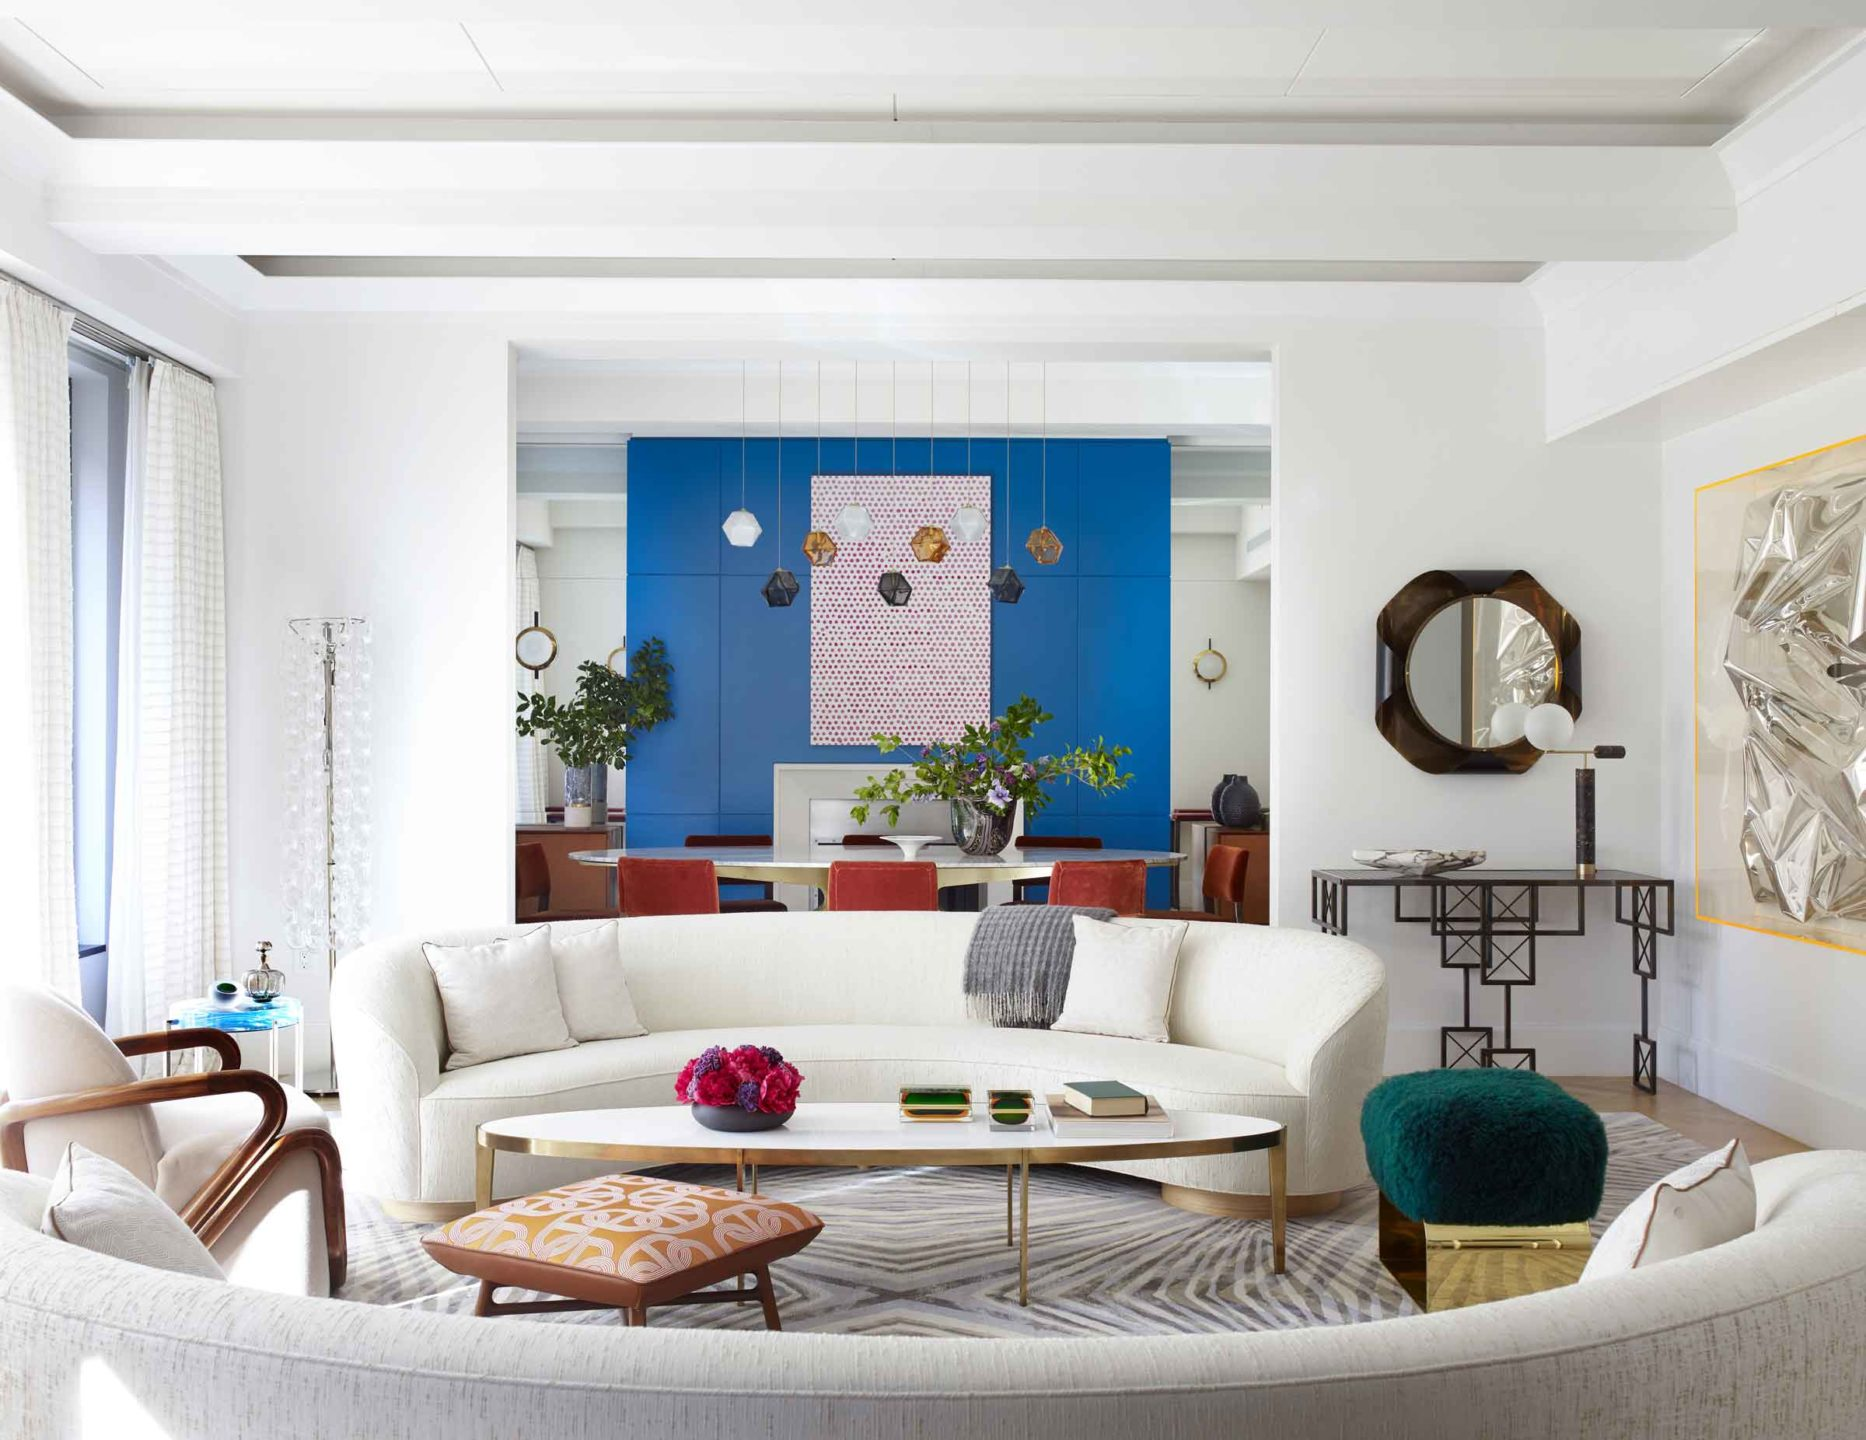 Nicole-Fuller-greenwich-village-living-room-new-york-interior-designer-9